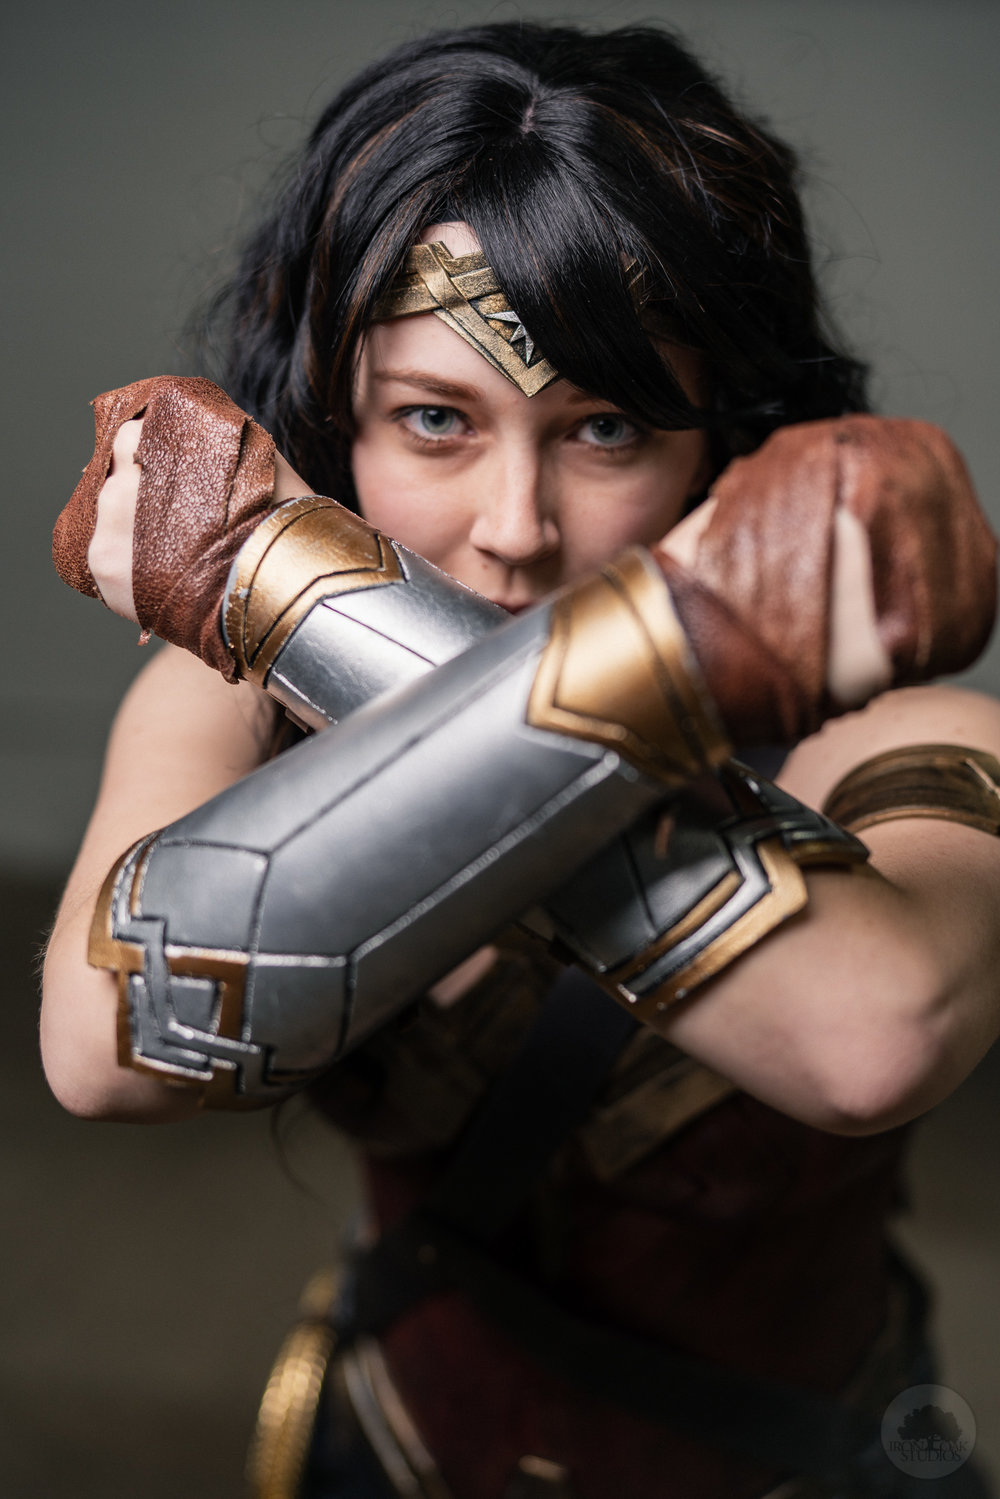 IronOakStudios_Phila_ComicCon_WonderWoman_Cosplay-4.jpg